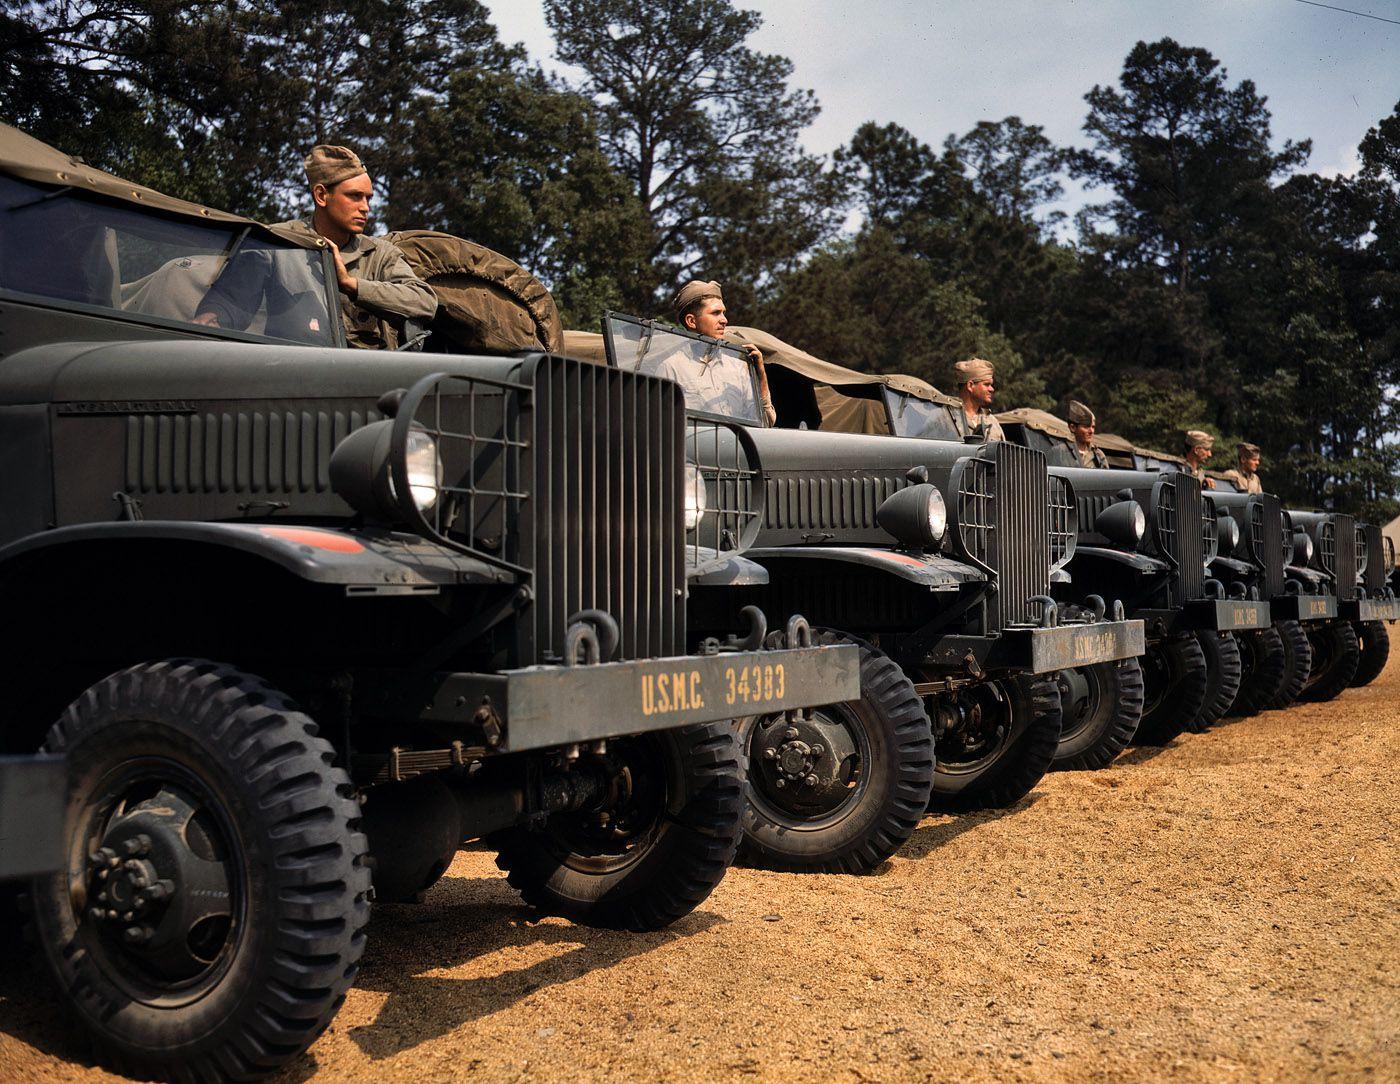 1a35184u - Mai 1942 : Détachement motorisé à la base USMC de New River, North Carolina.